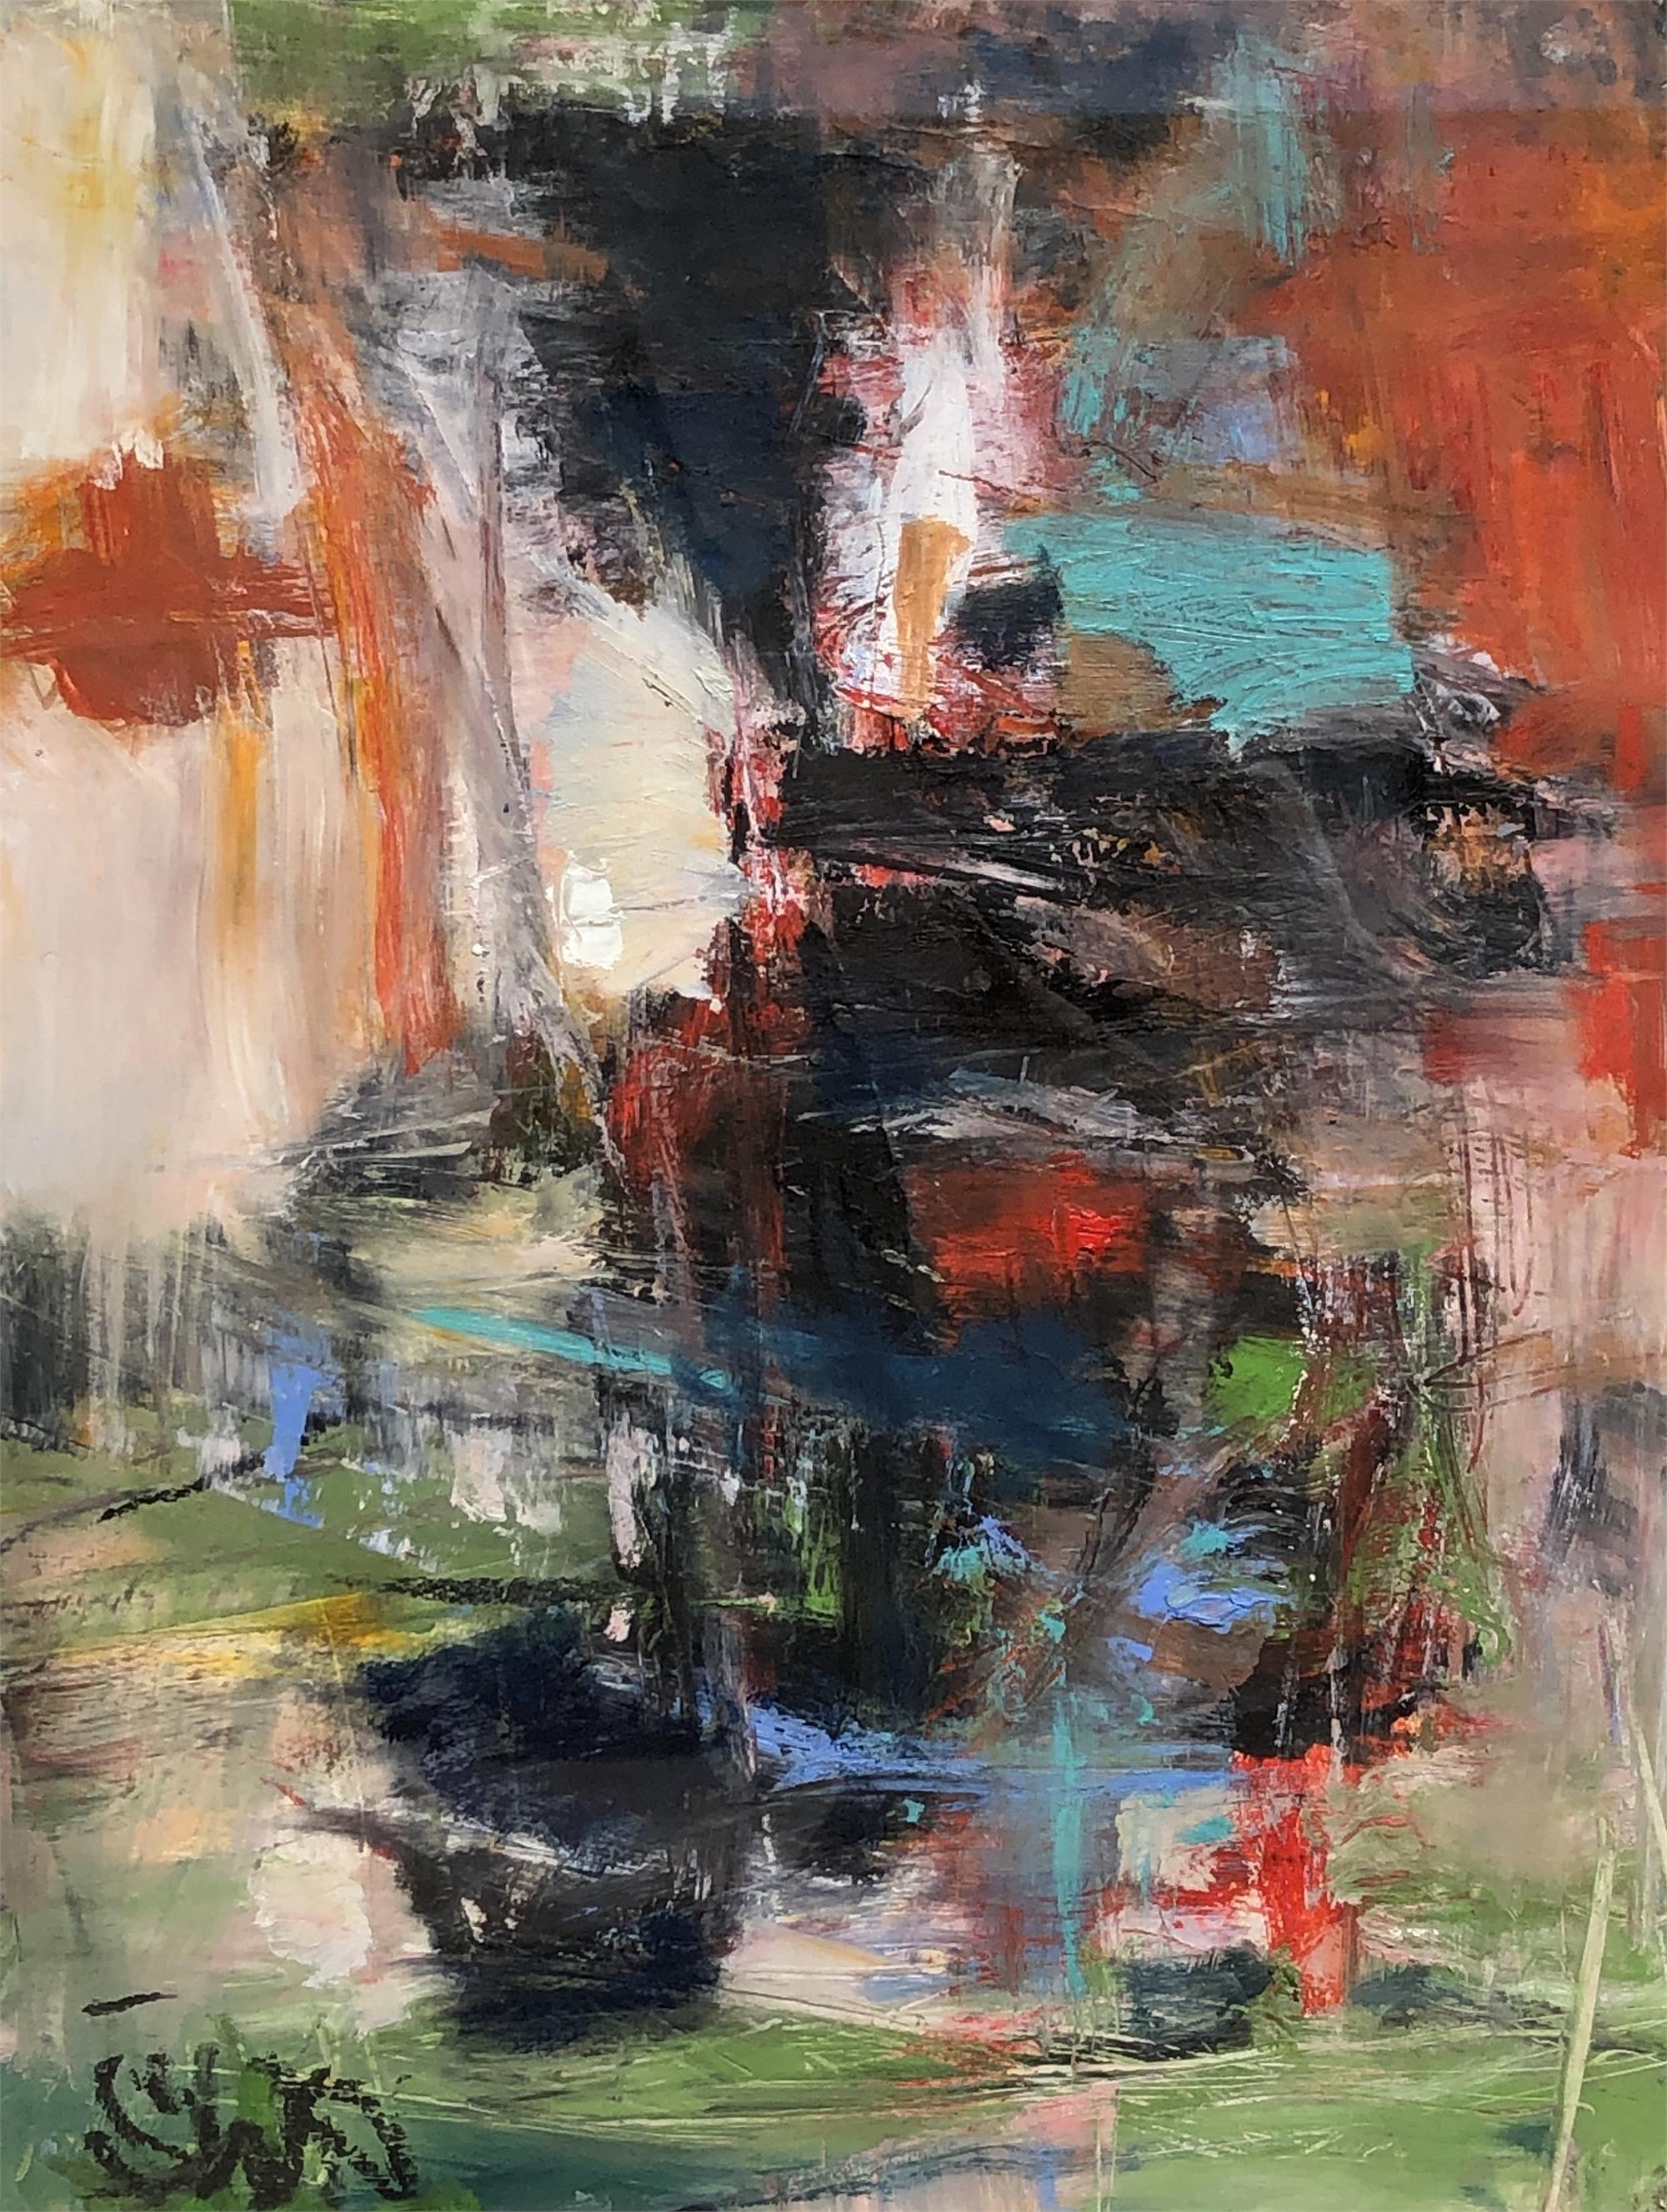 Processing Through Life by Susan Altman